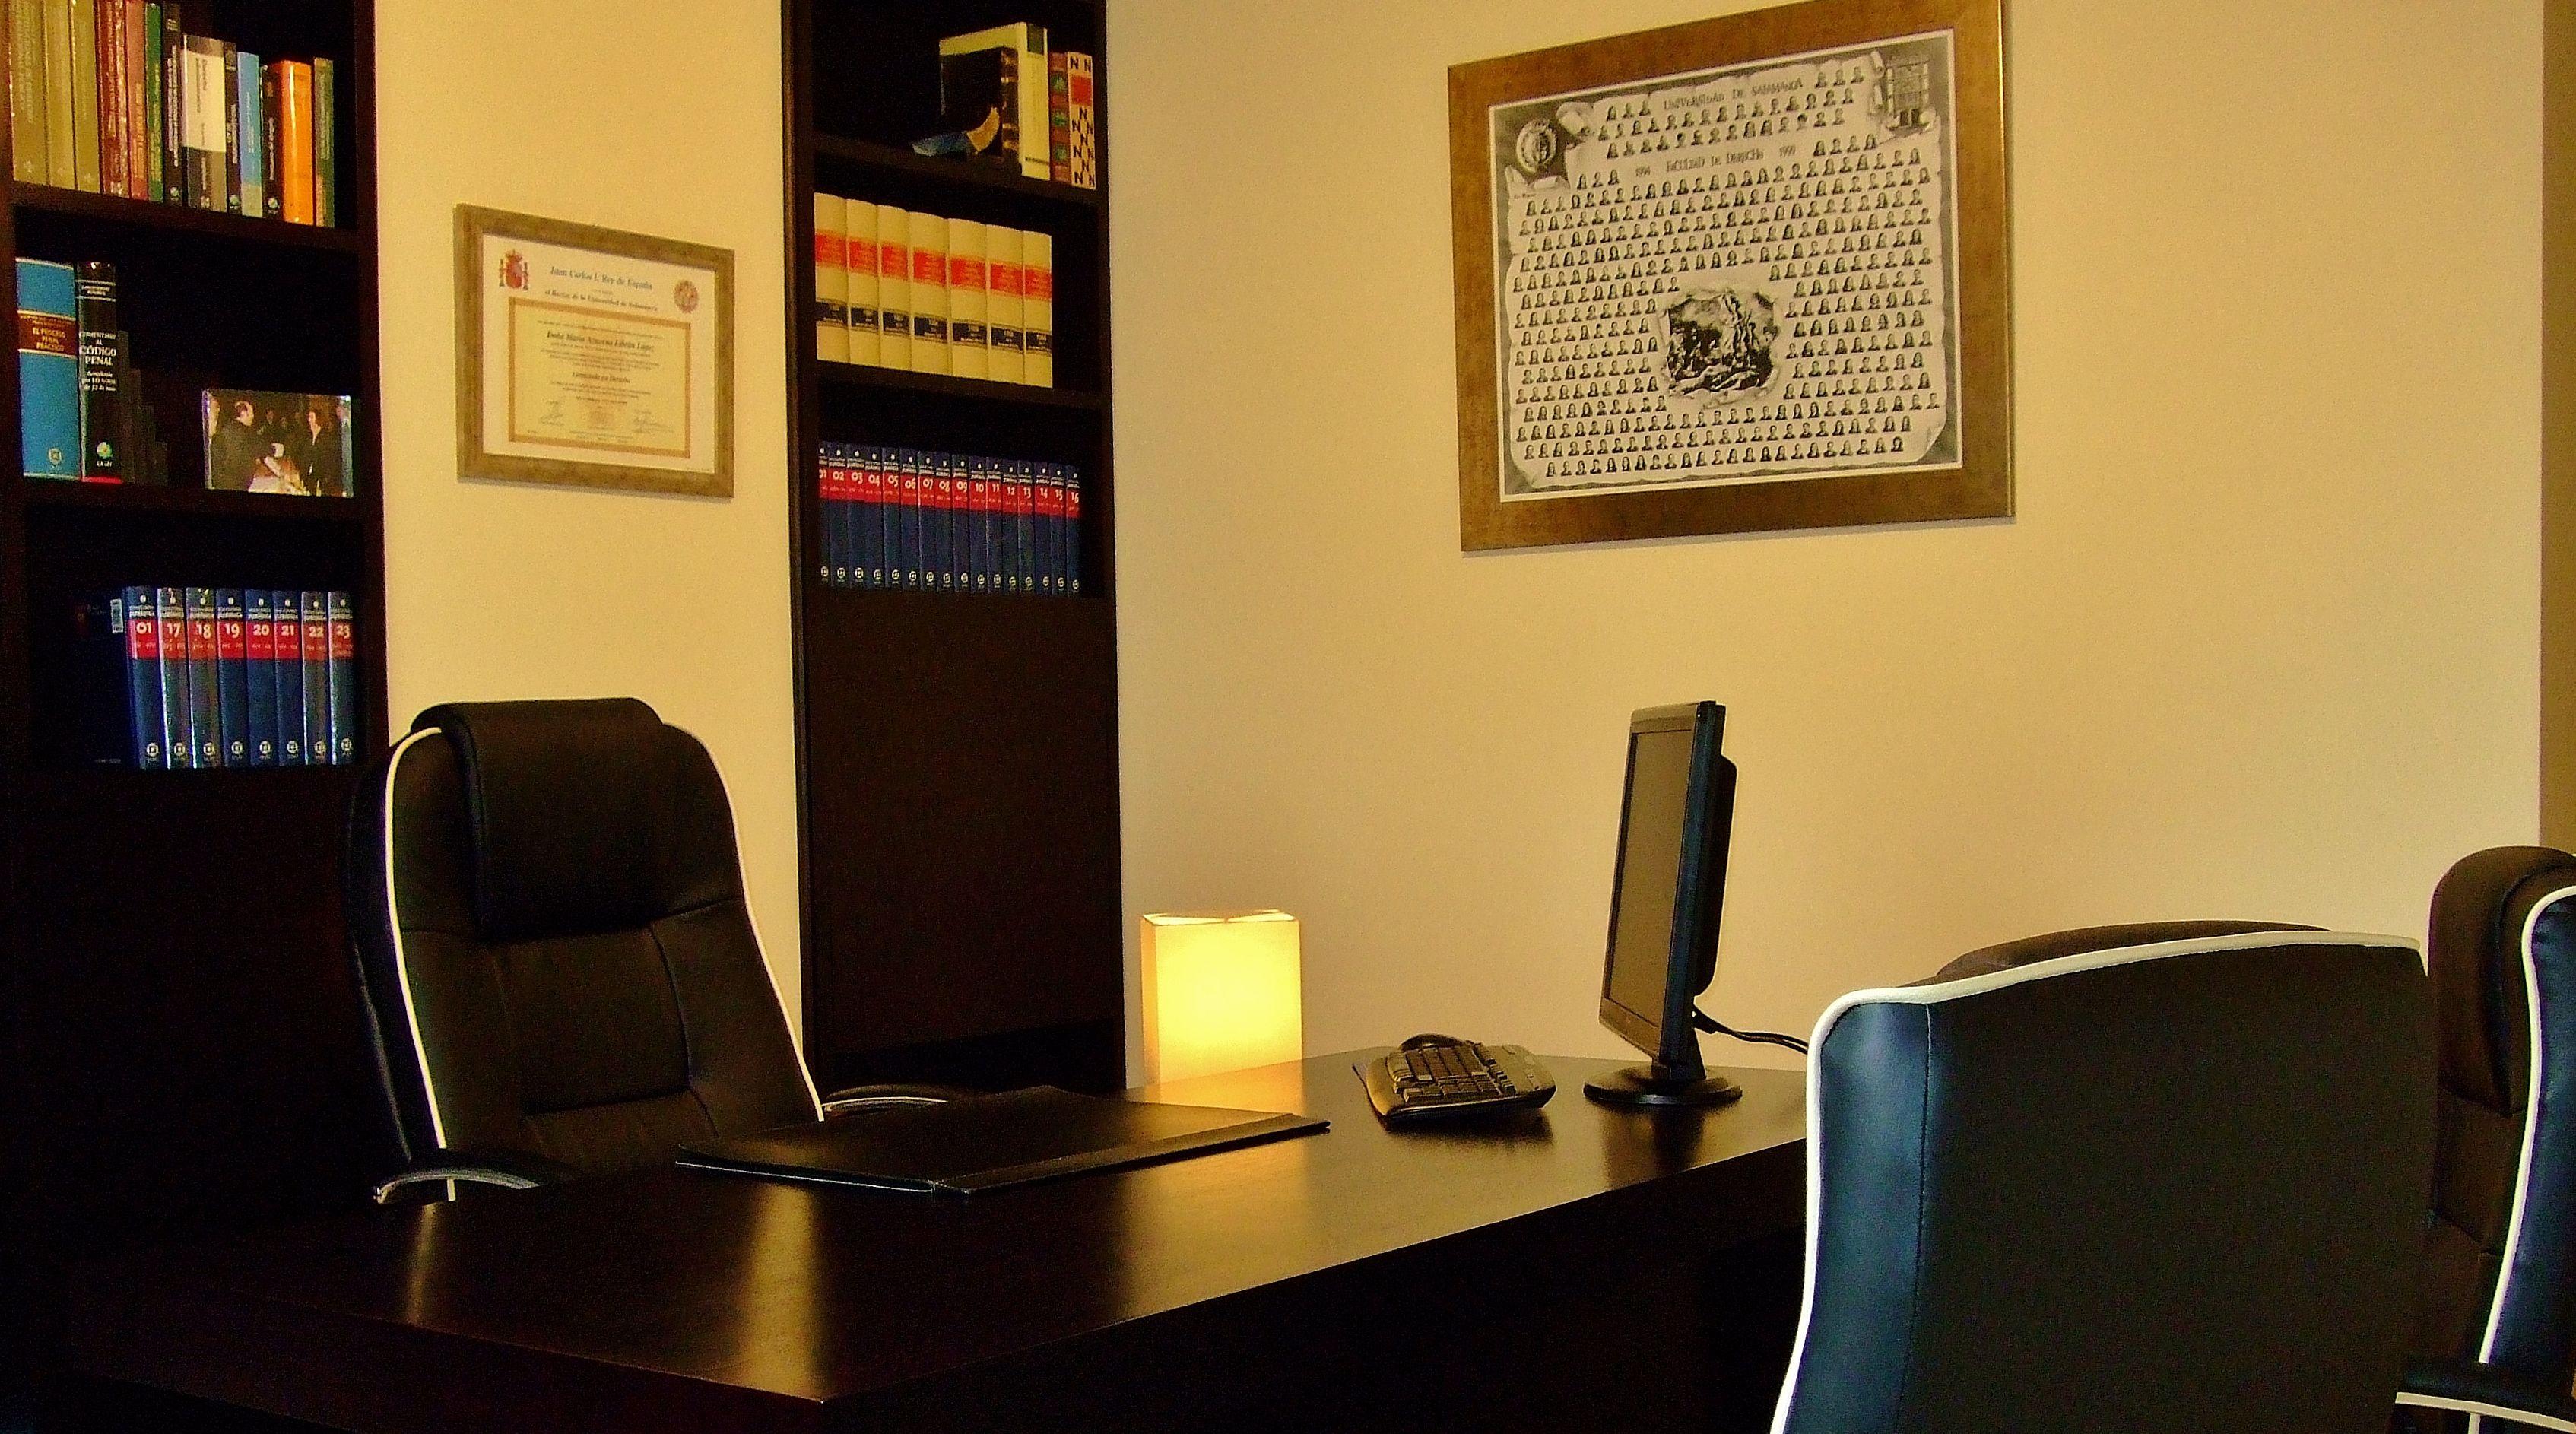 Despacho de abogados en ponferrada azucena libr n for Despacho de abogados